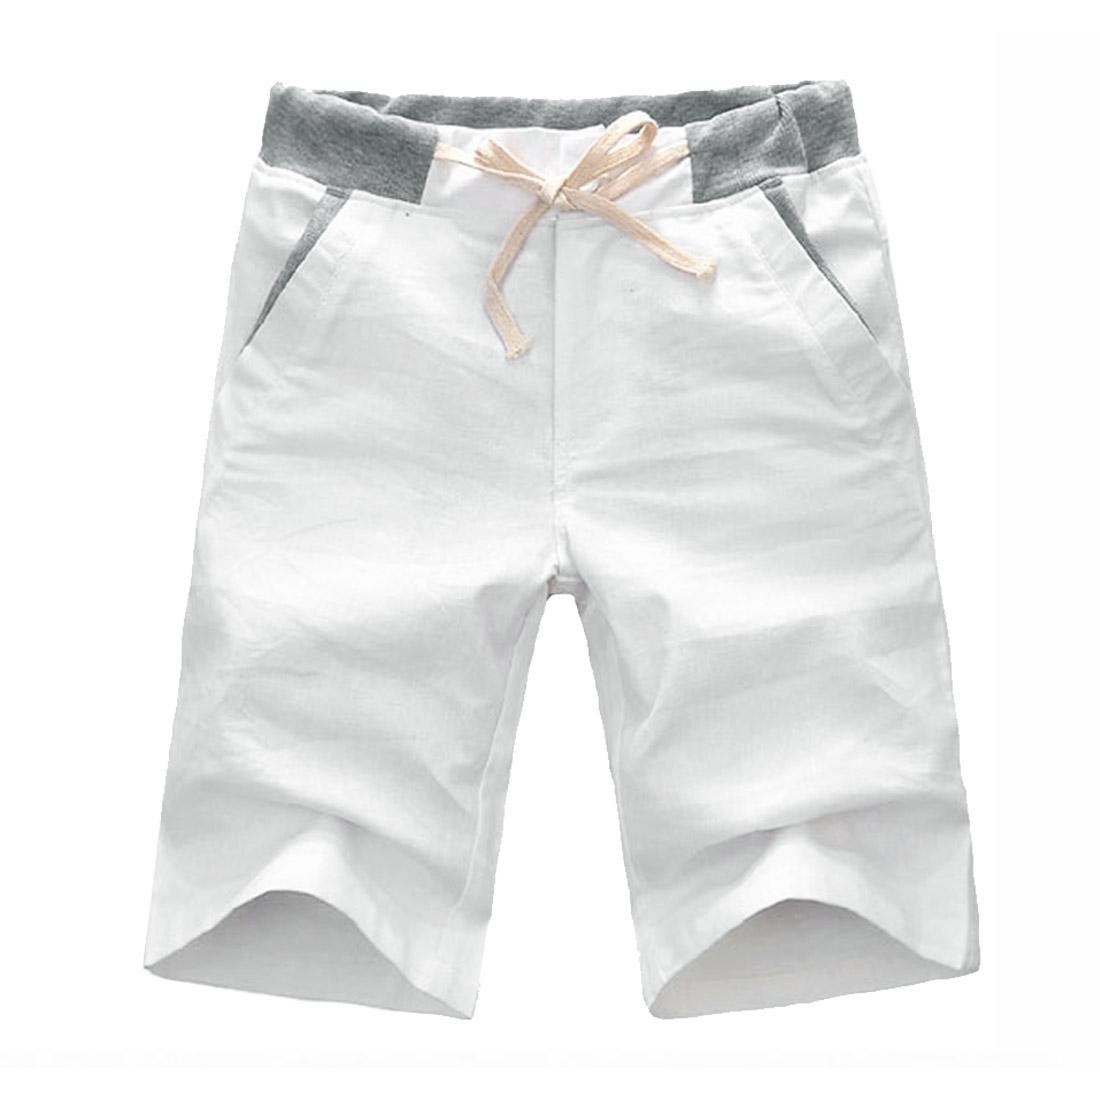 Men Linen Buttons Drawstring Casual Short Trousers White W31